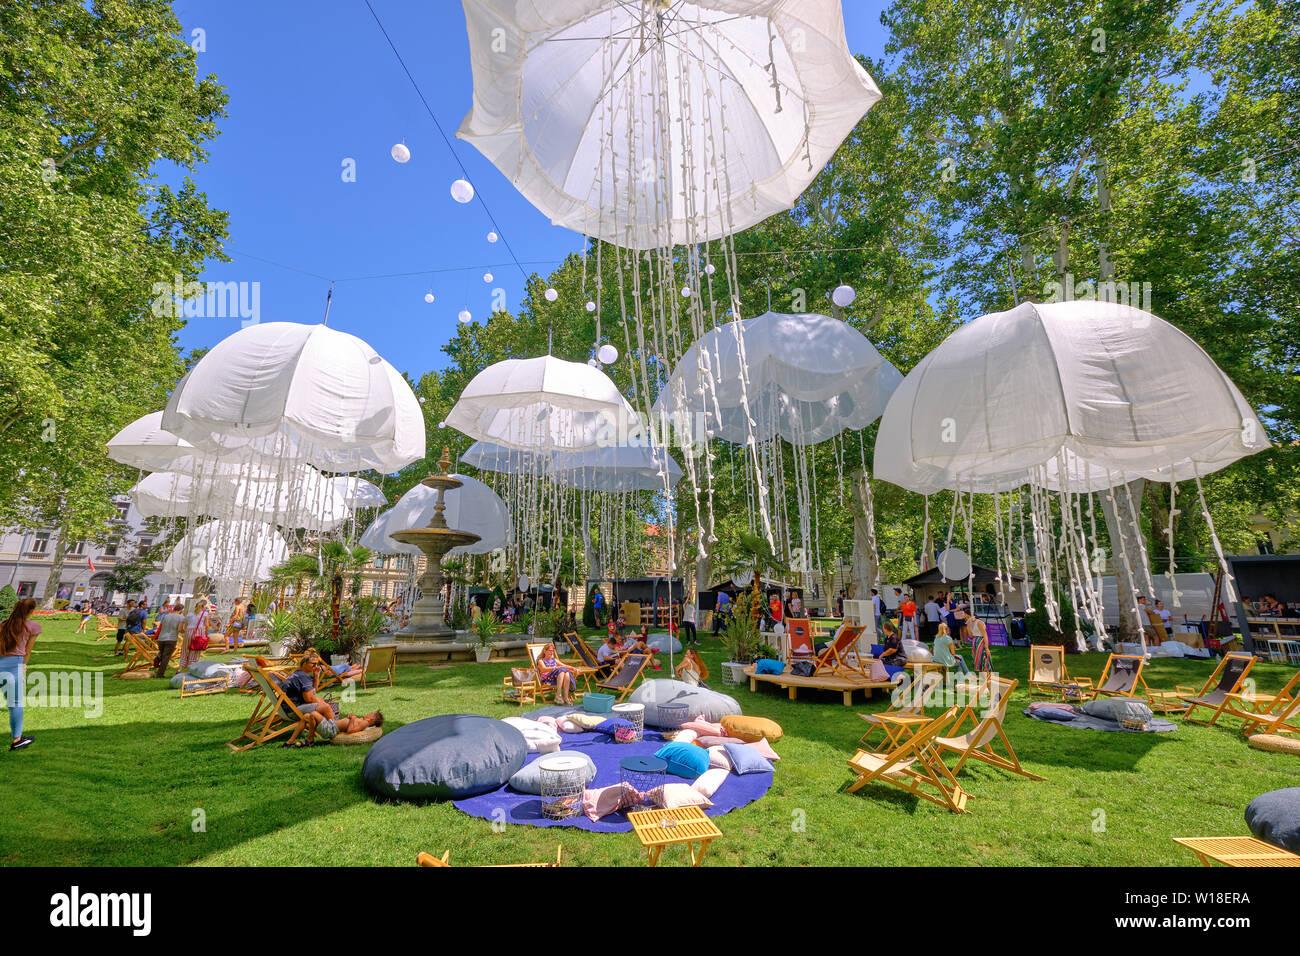 zagreb-croatia-july-1-2019-lumen-station-installation-in-park-outdoor-reading-pods-in-green-city-park-under-squid-like-hanging-umbrellas-W18ERA.jpg